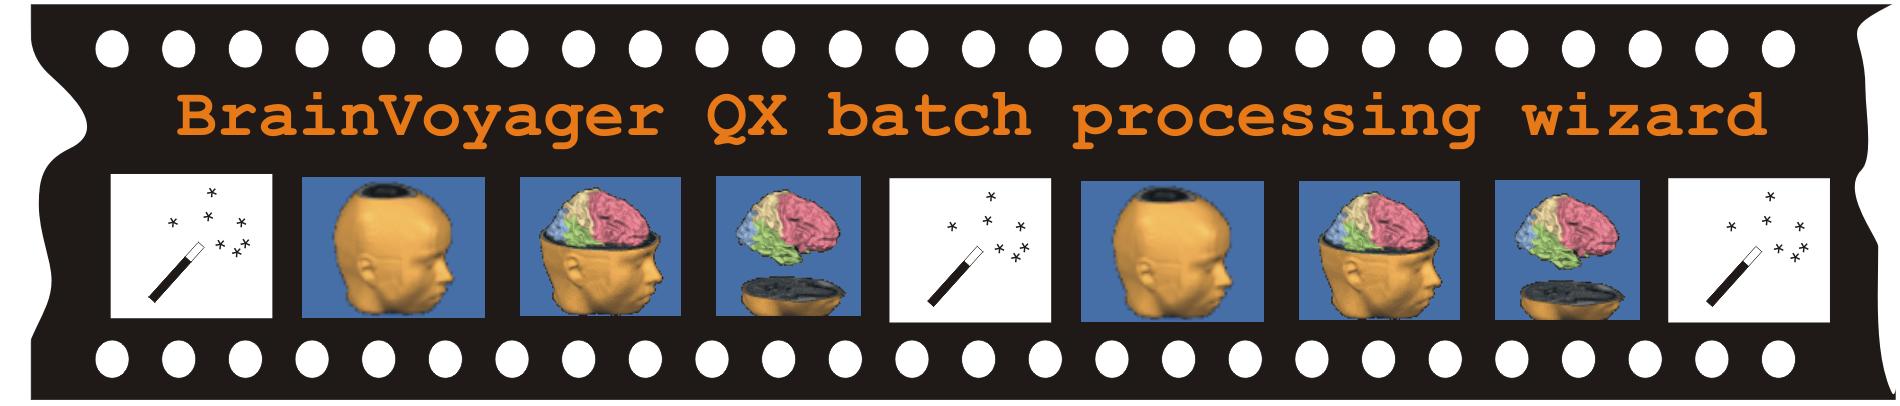 batchprocessingwizardlogo